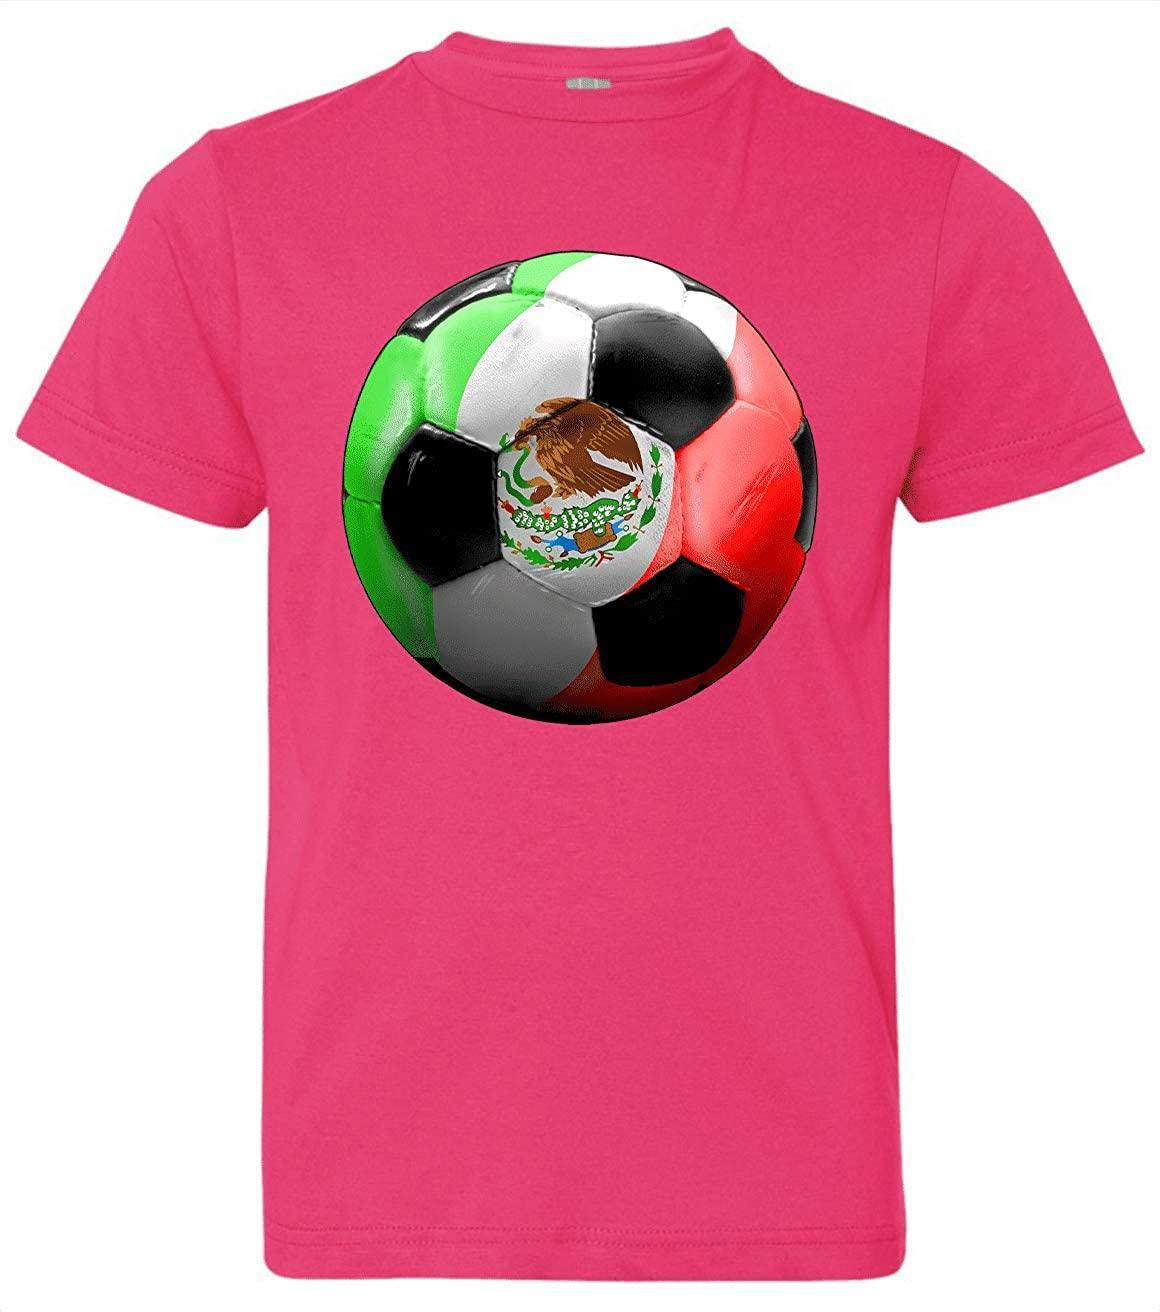 HARD EDGE DESIGN Boy's Youth Mexico Soccer T-Shirt, Medium, Hot Pink